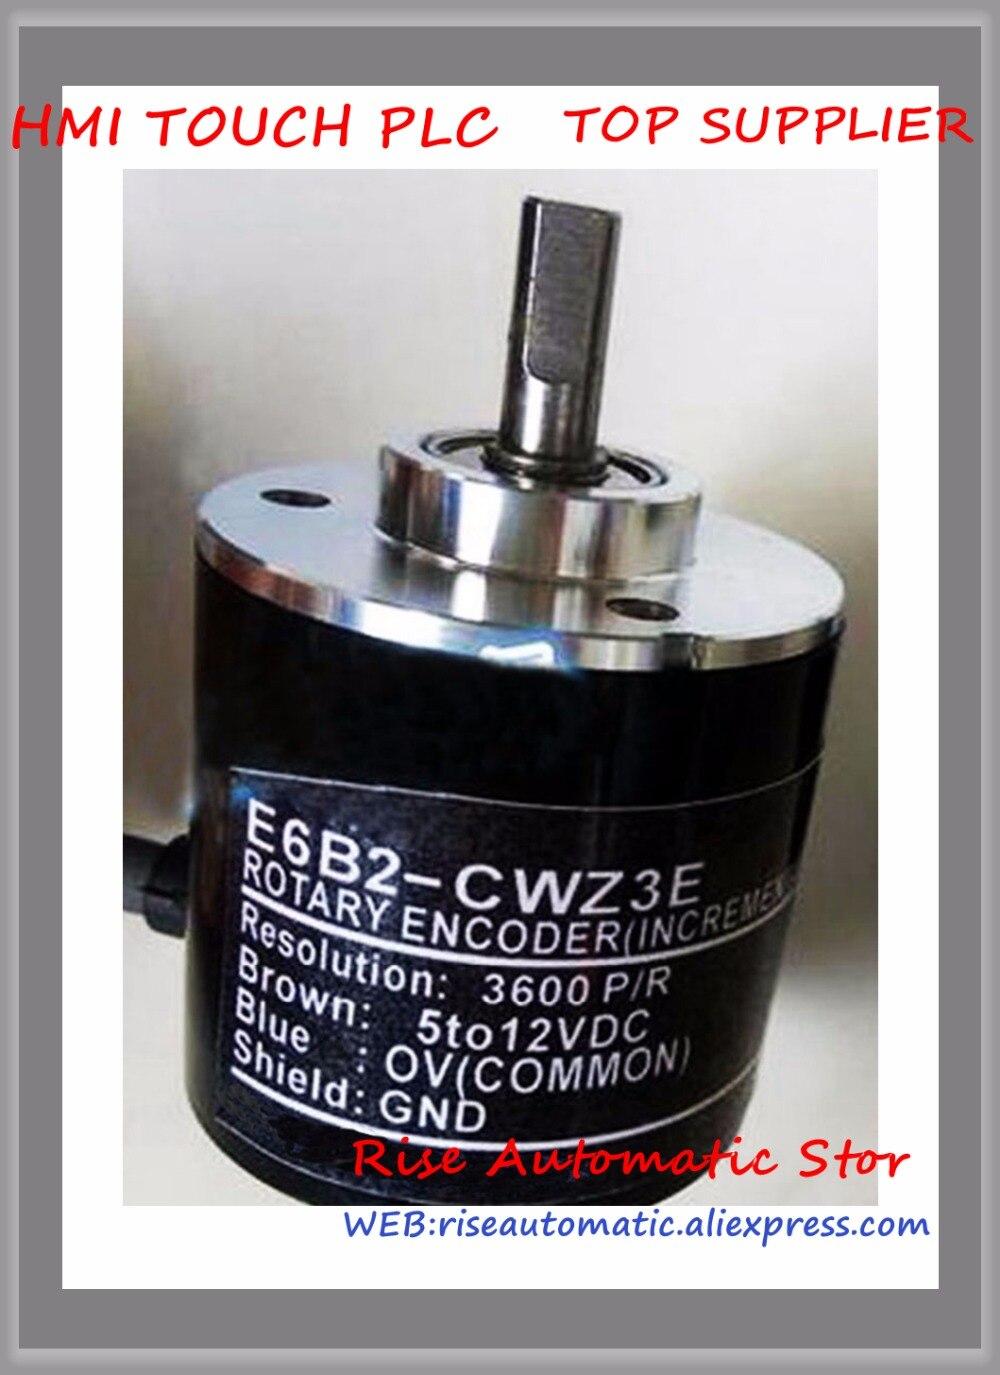 E6B2-CWZ3E 3600P/R Incremental Rotary Encoder 5-12V DC e6b2 cwz3e 3600p r freeship omr incremental rotary encoder 5 12v dc 1 year warranty